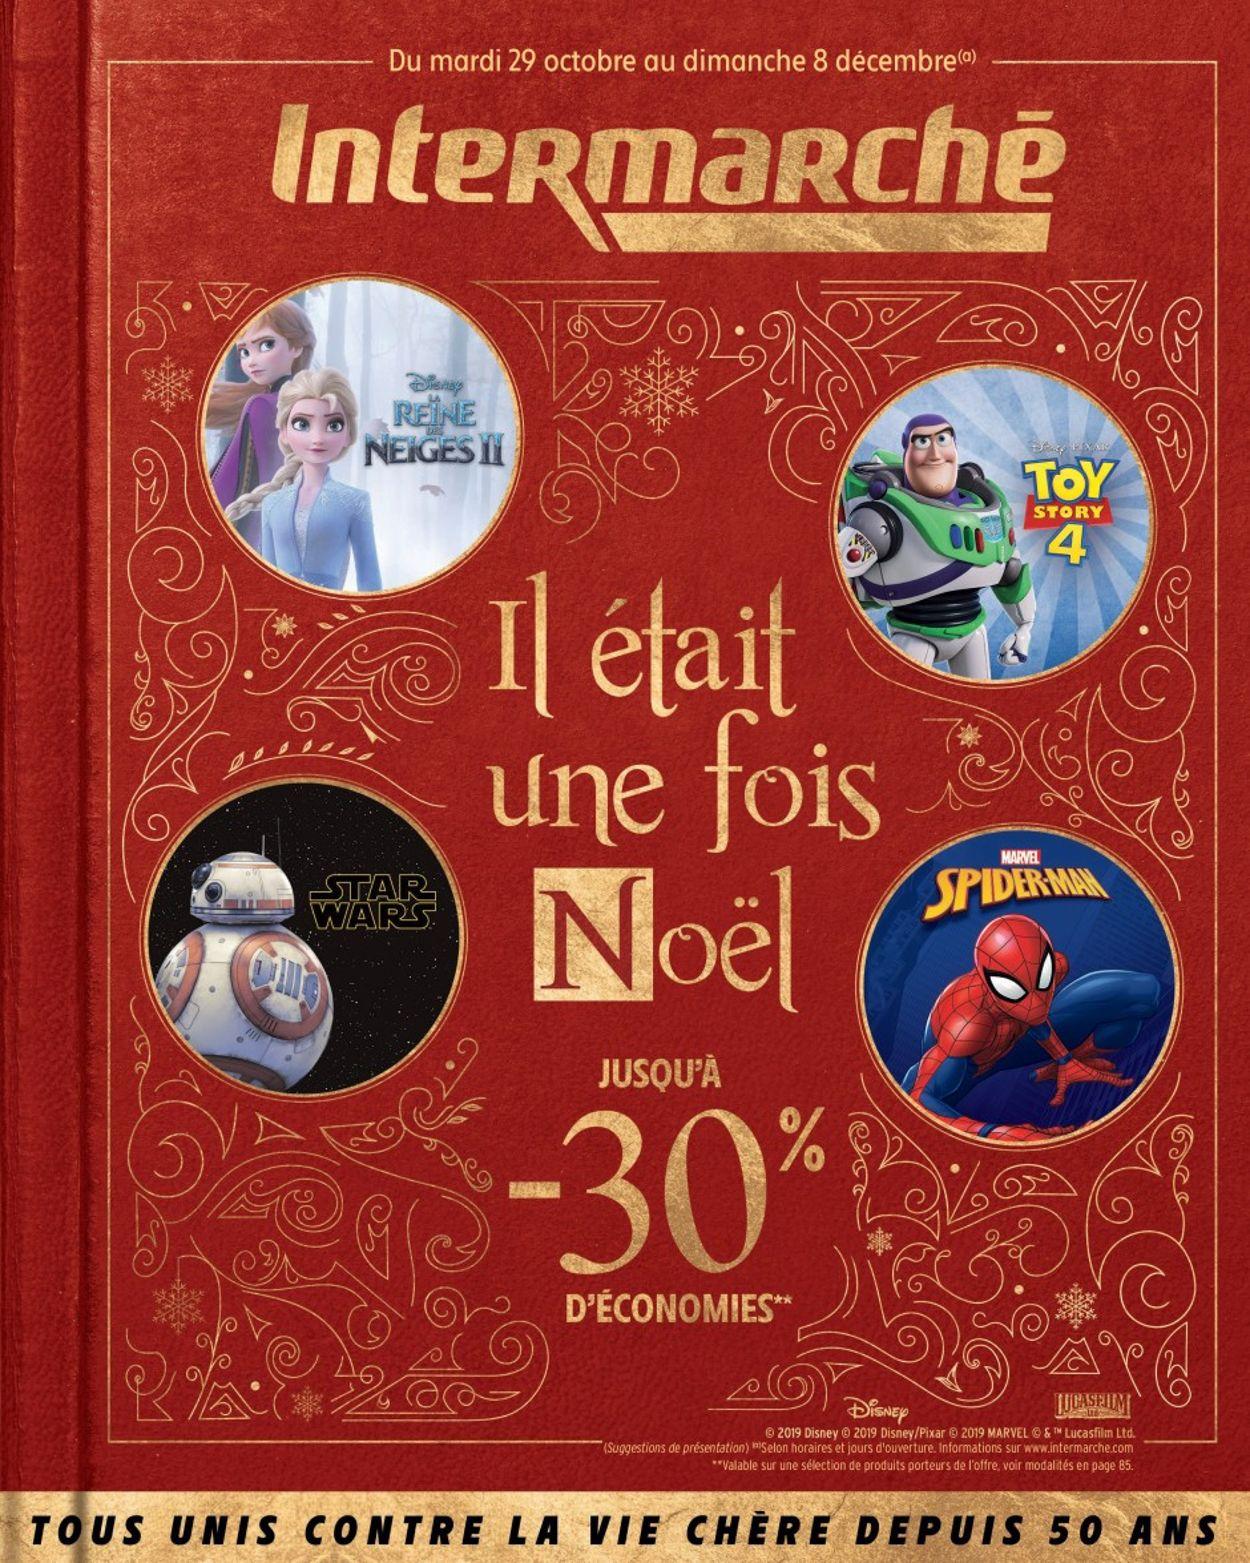 Intermarché Catalogue - 29.10-08.12.2019